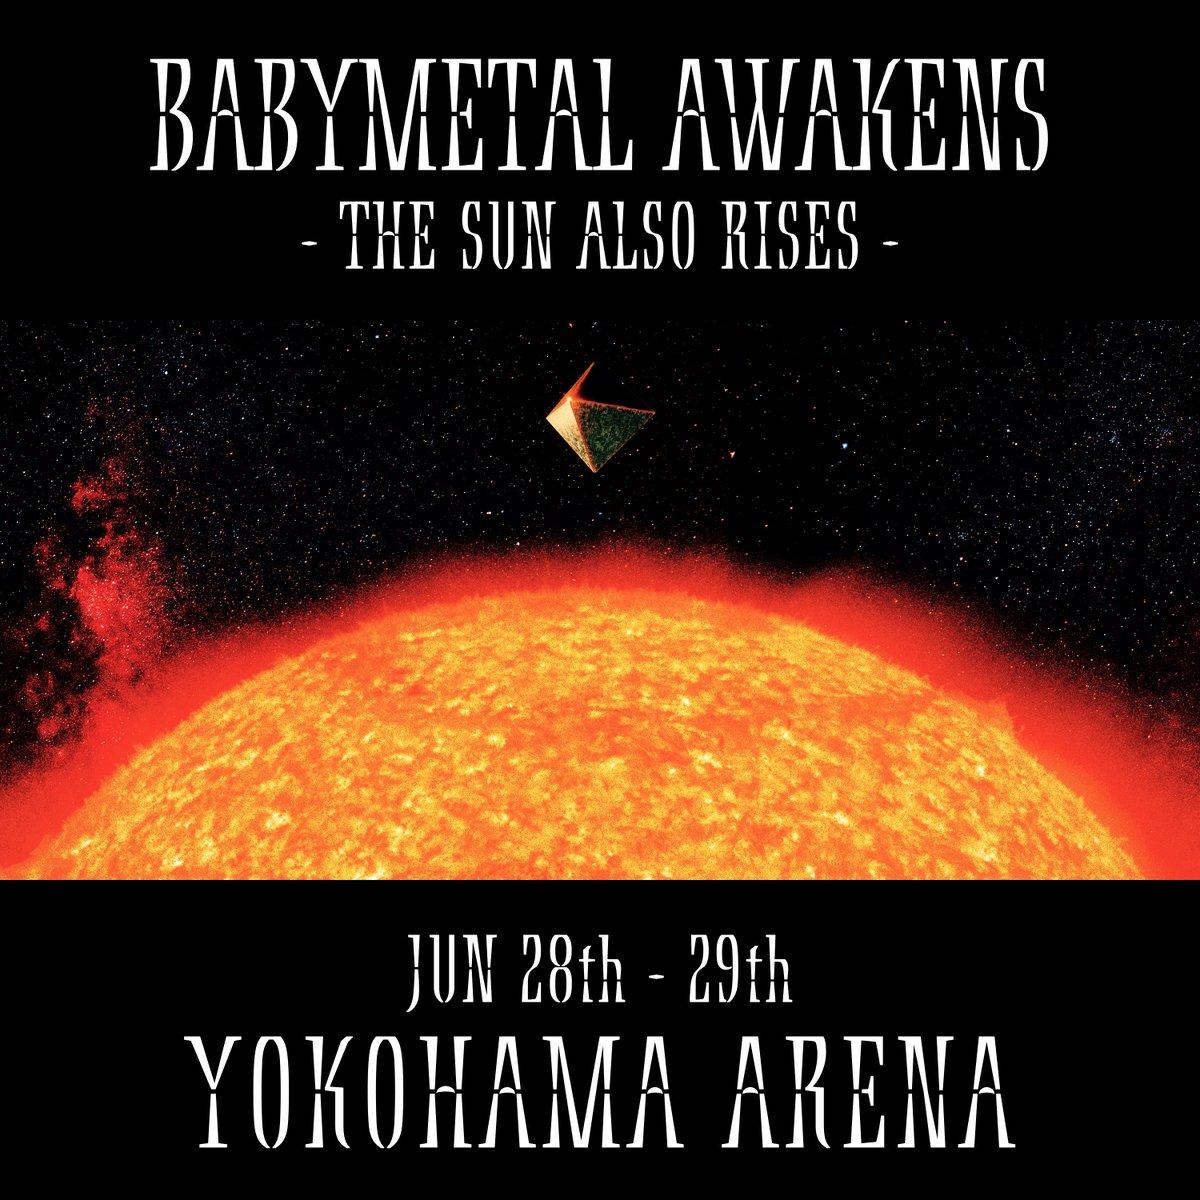 BABYMETAL横浜アリーナ公演専用の自由掲示板